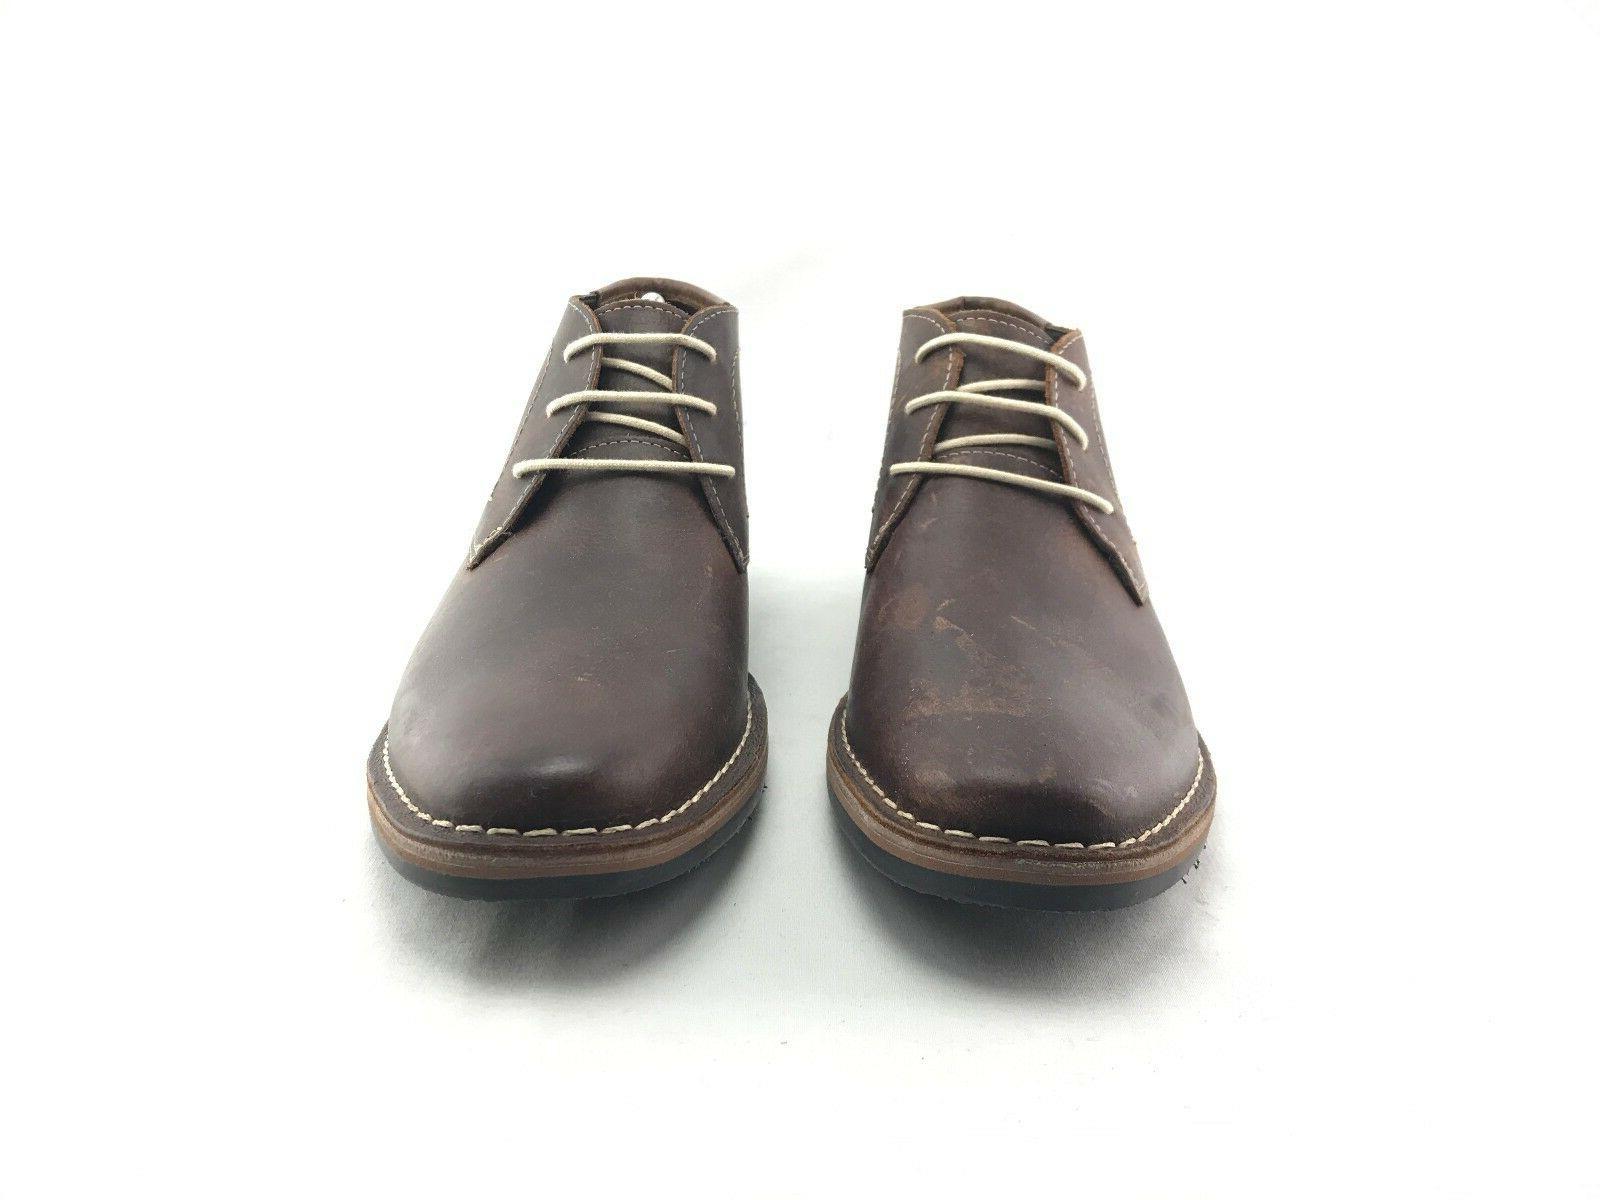 Steve Madden US Size Shoes